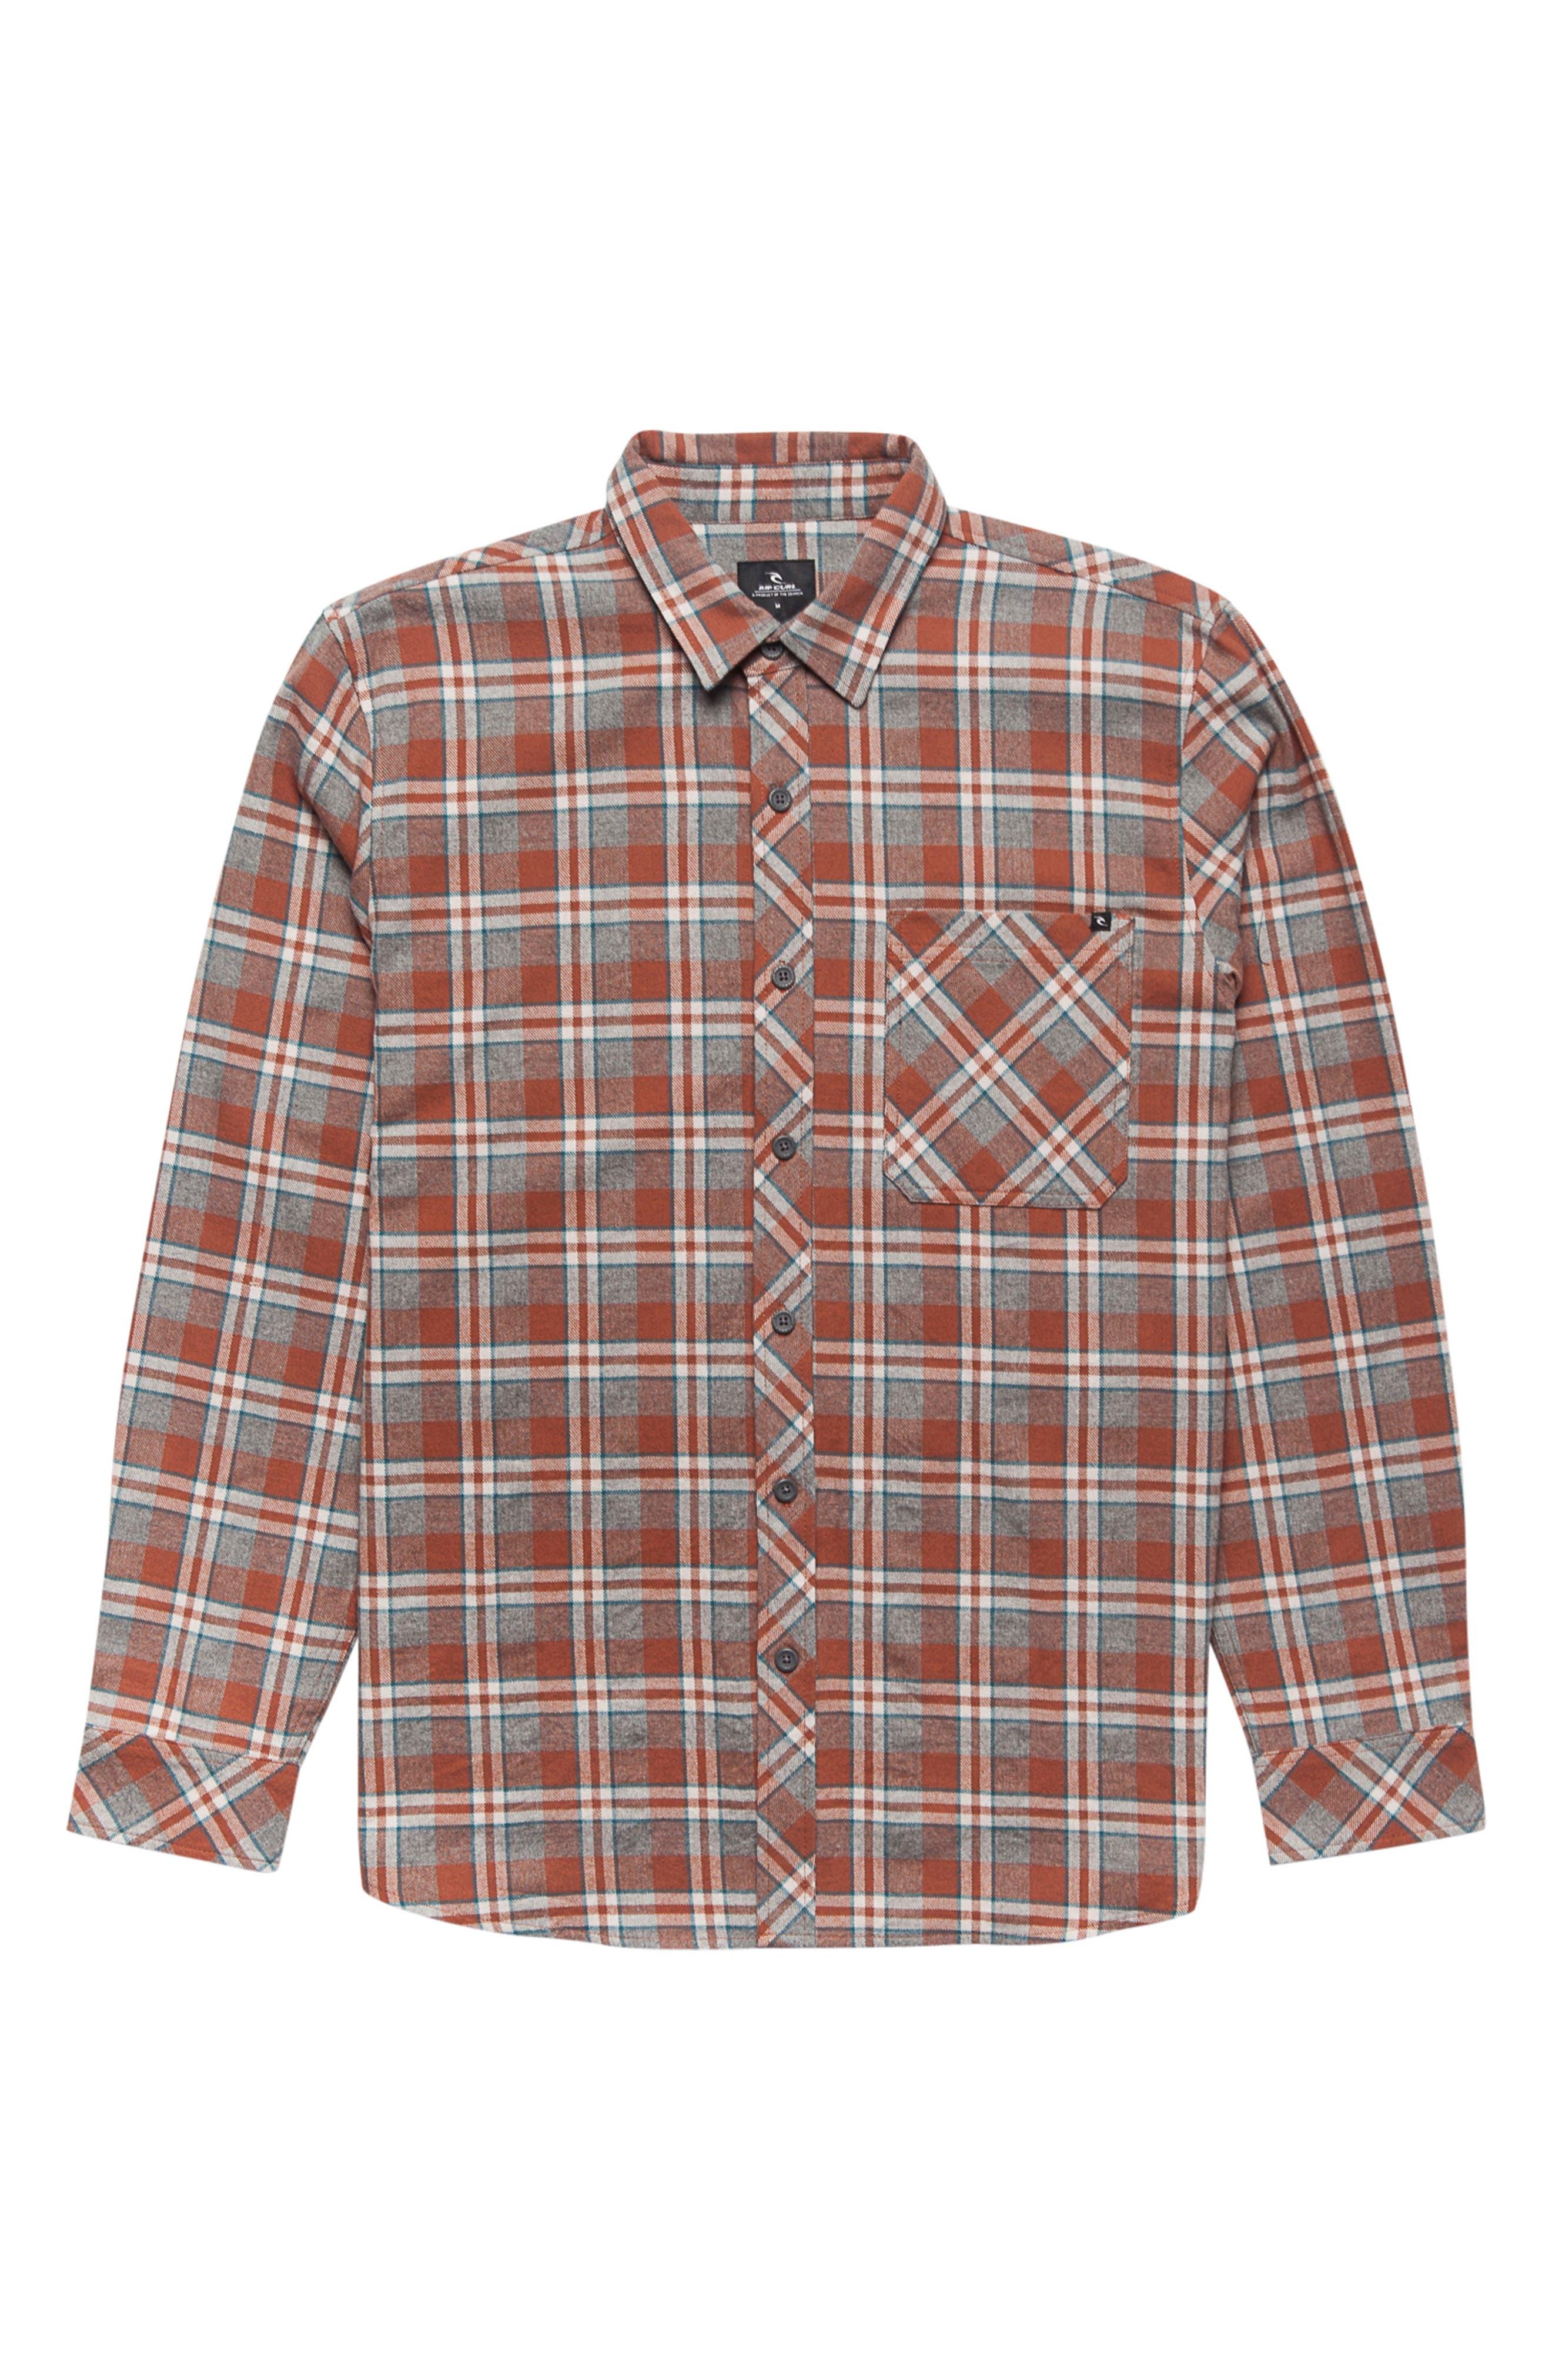 Mundo Plaid Flannel Shirt,                         Main,                         color, Red